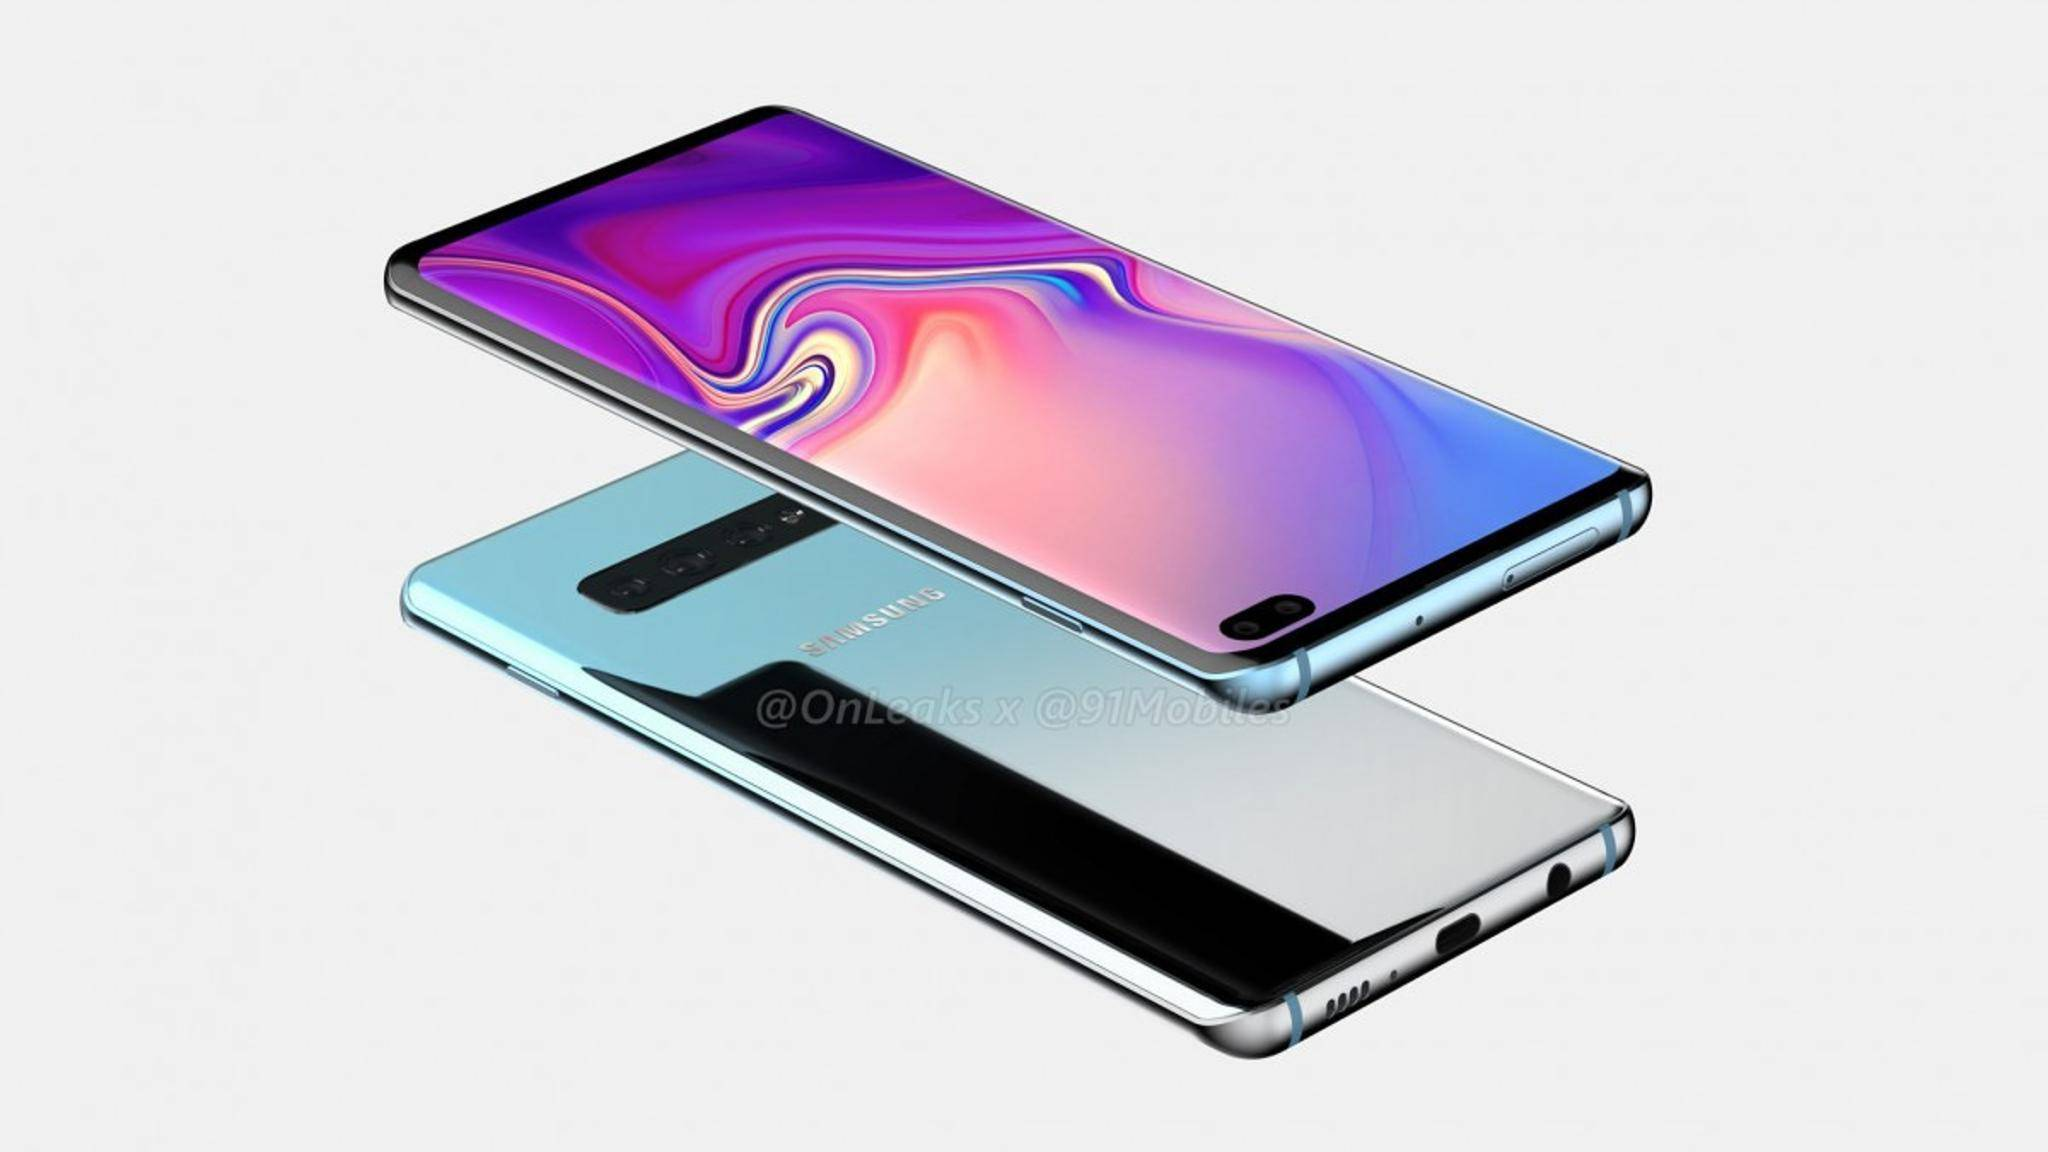 So soll das Samsung Galaxy S10 Plus aussehen.